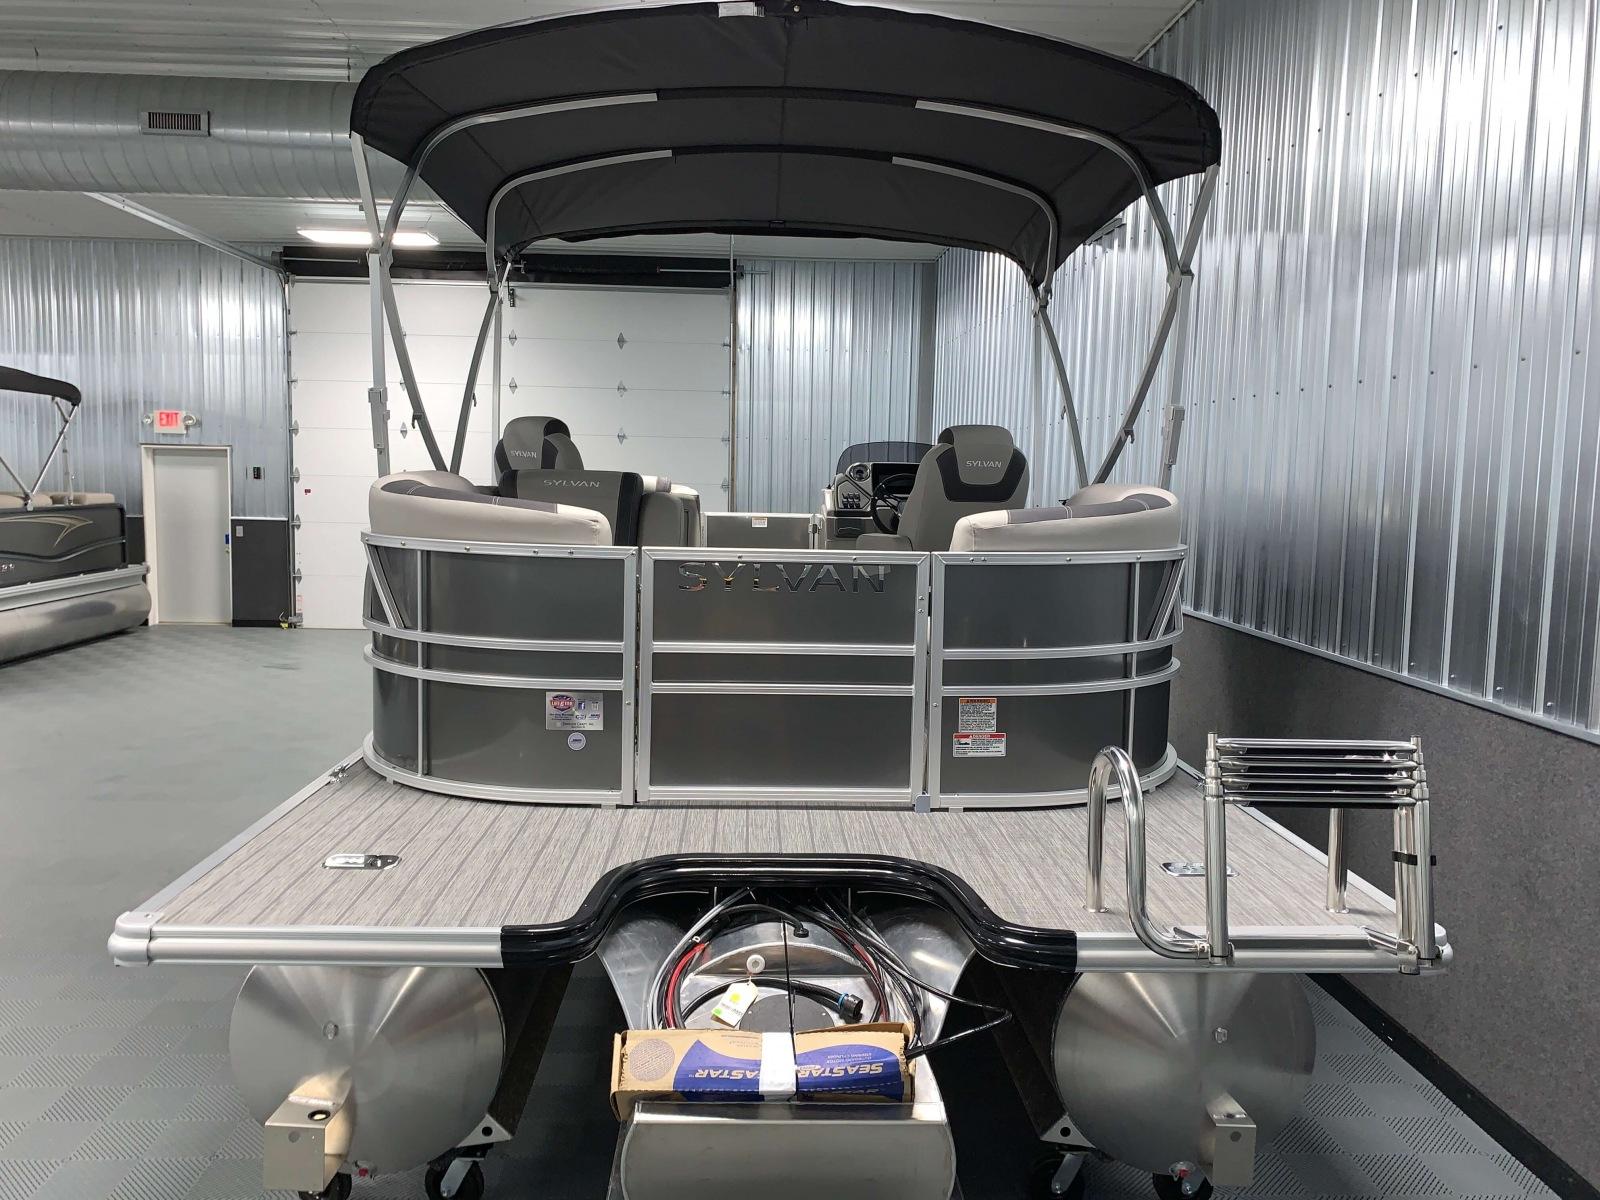 Extended Rear Swim Deck of a 2020 Sylvan L1 LZ Tritoon